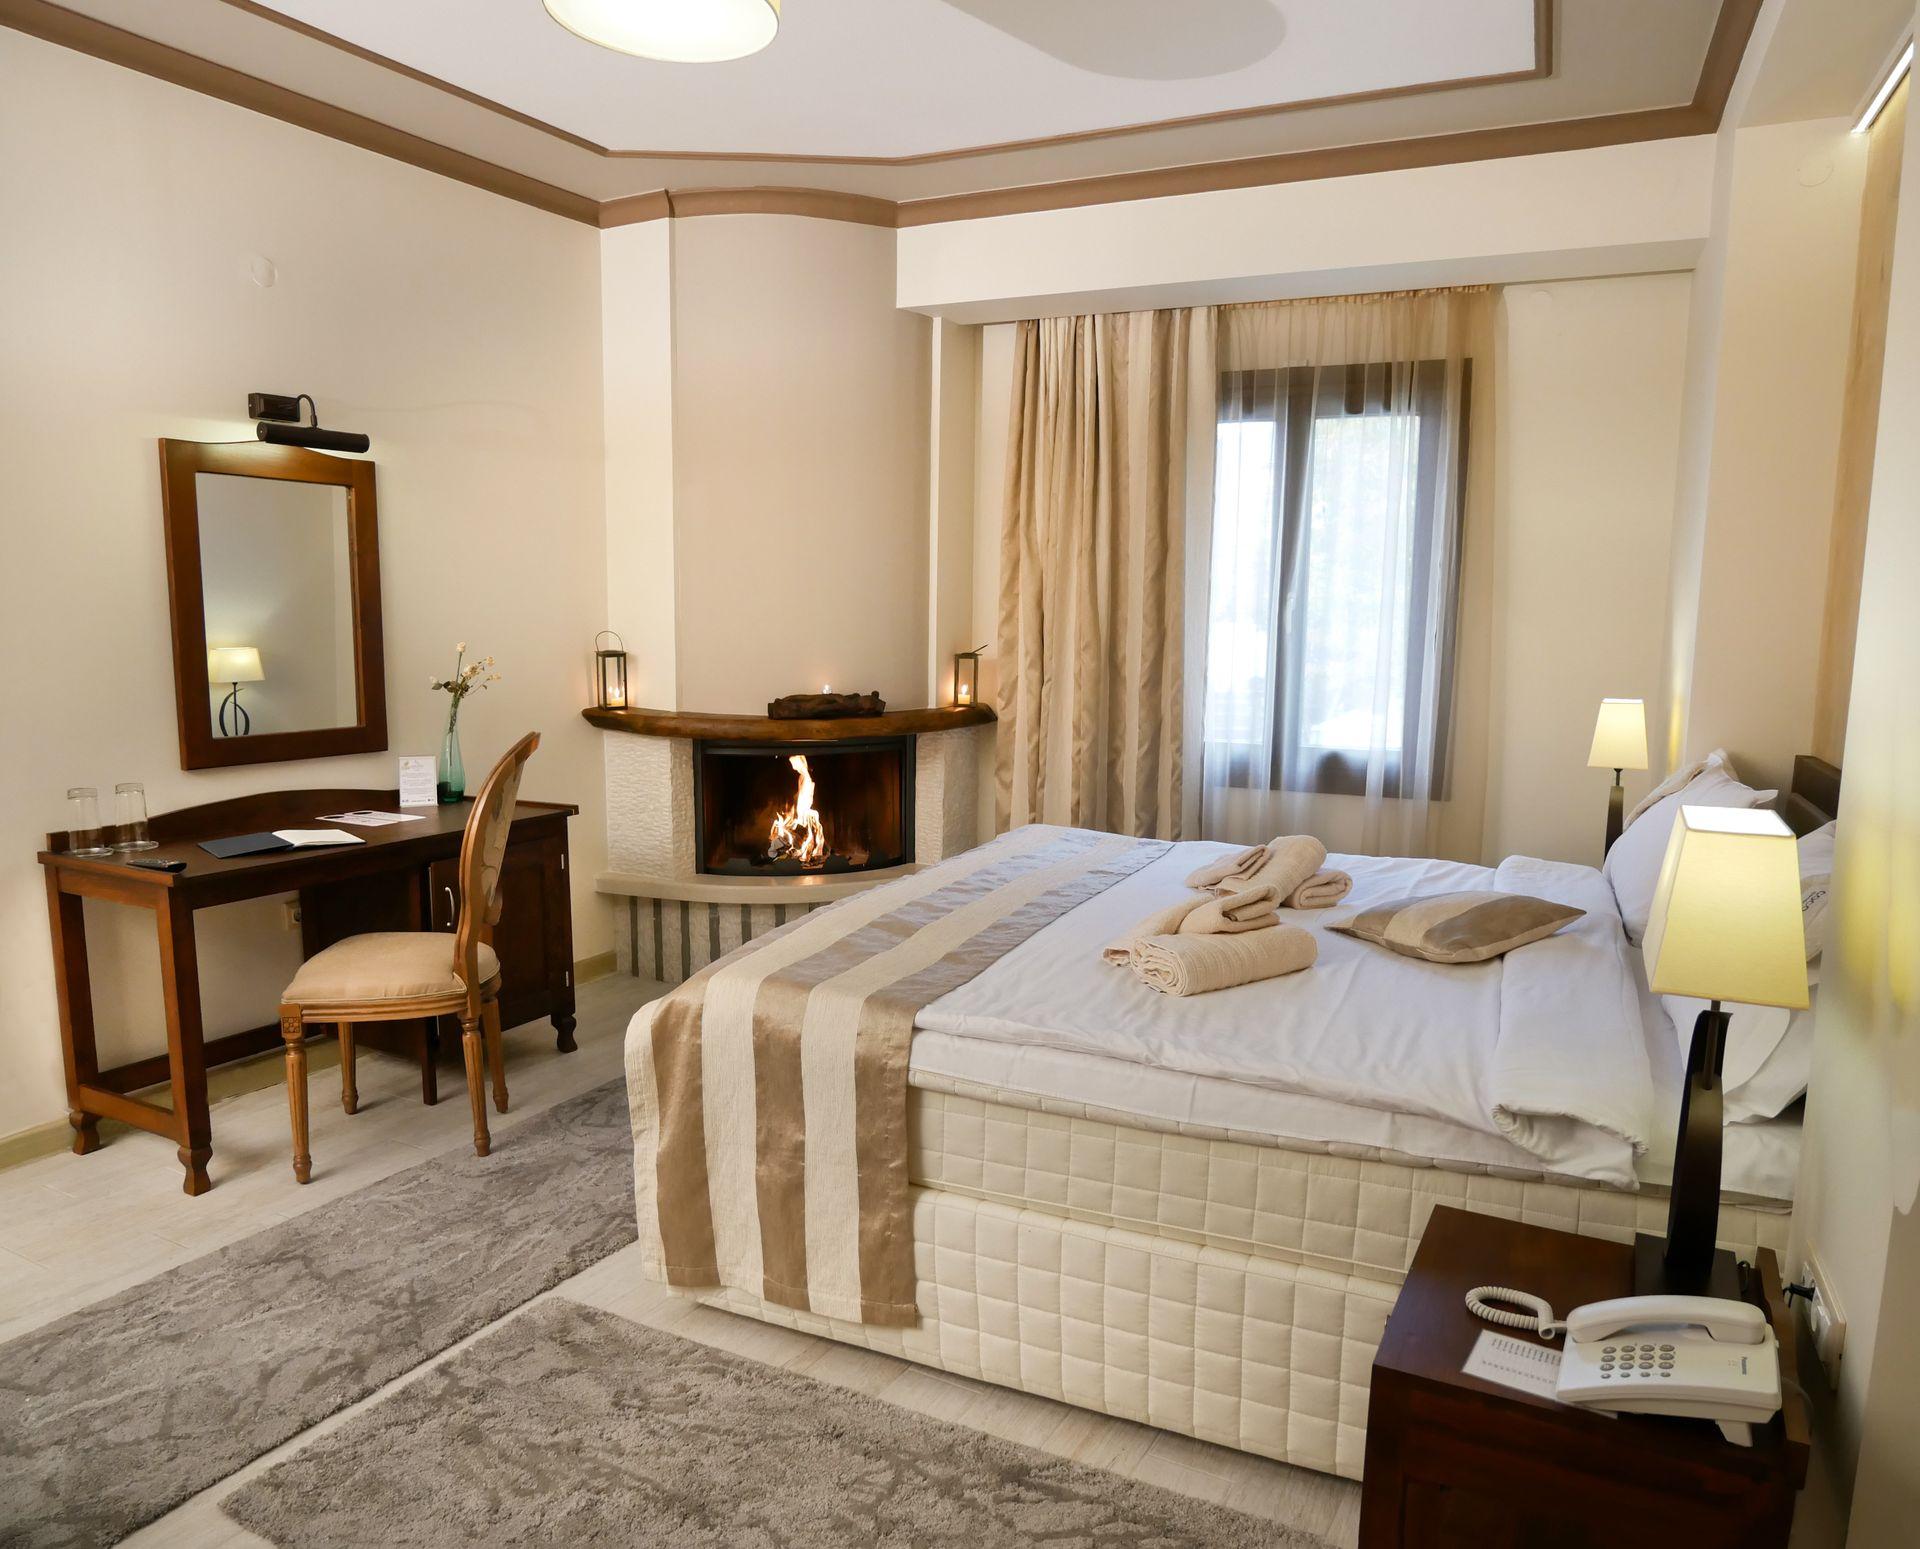 Rodovoli Hotel Konitsa - Κόνιτσα ✦ 6 Ημέρες (5 Διανυκτερεύσεις)